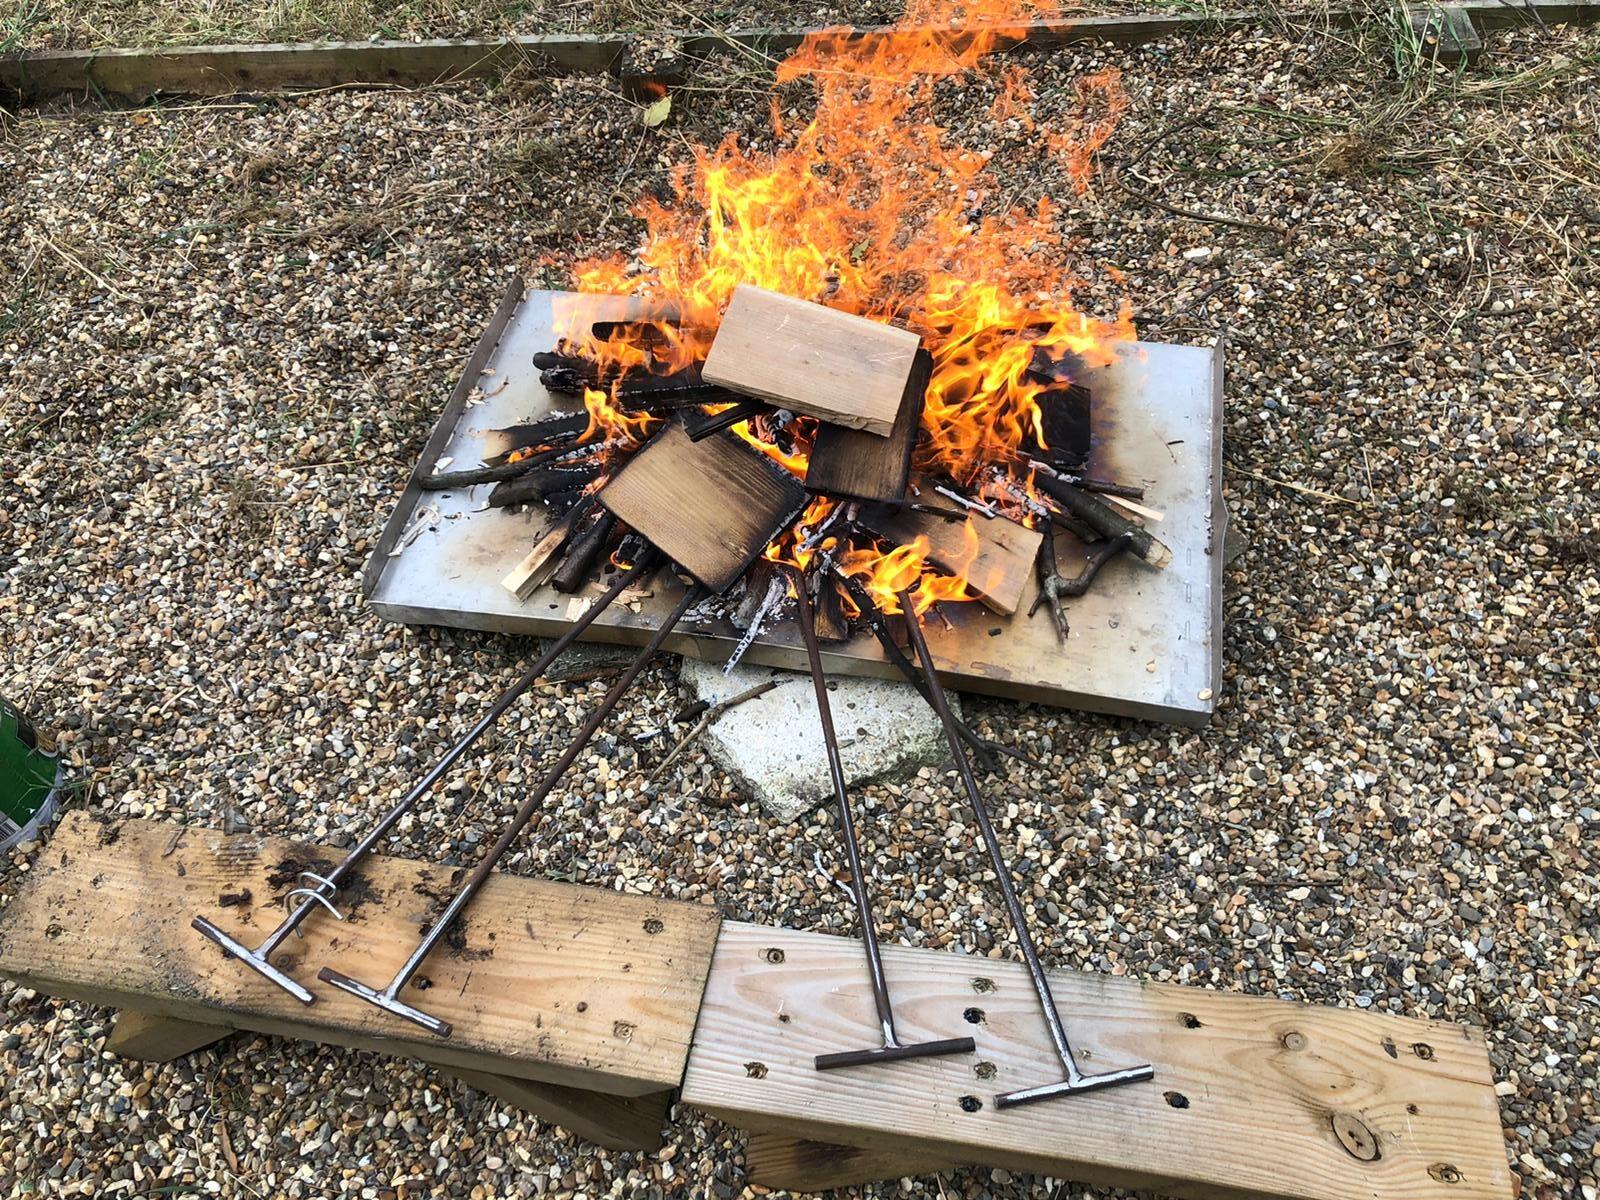 Backwoods Skills